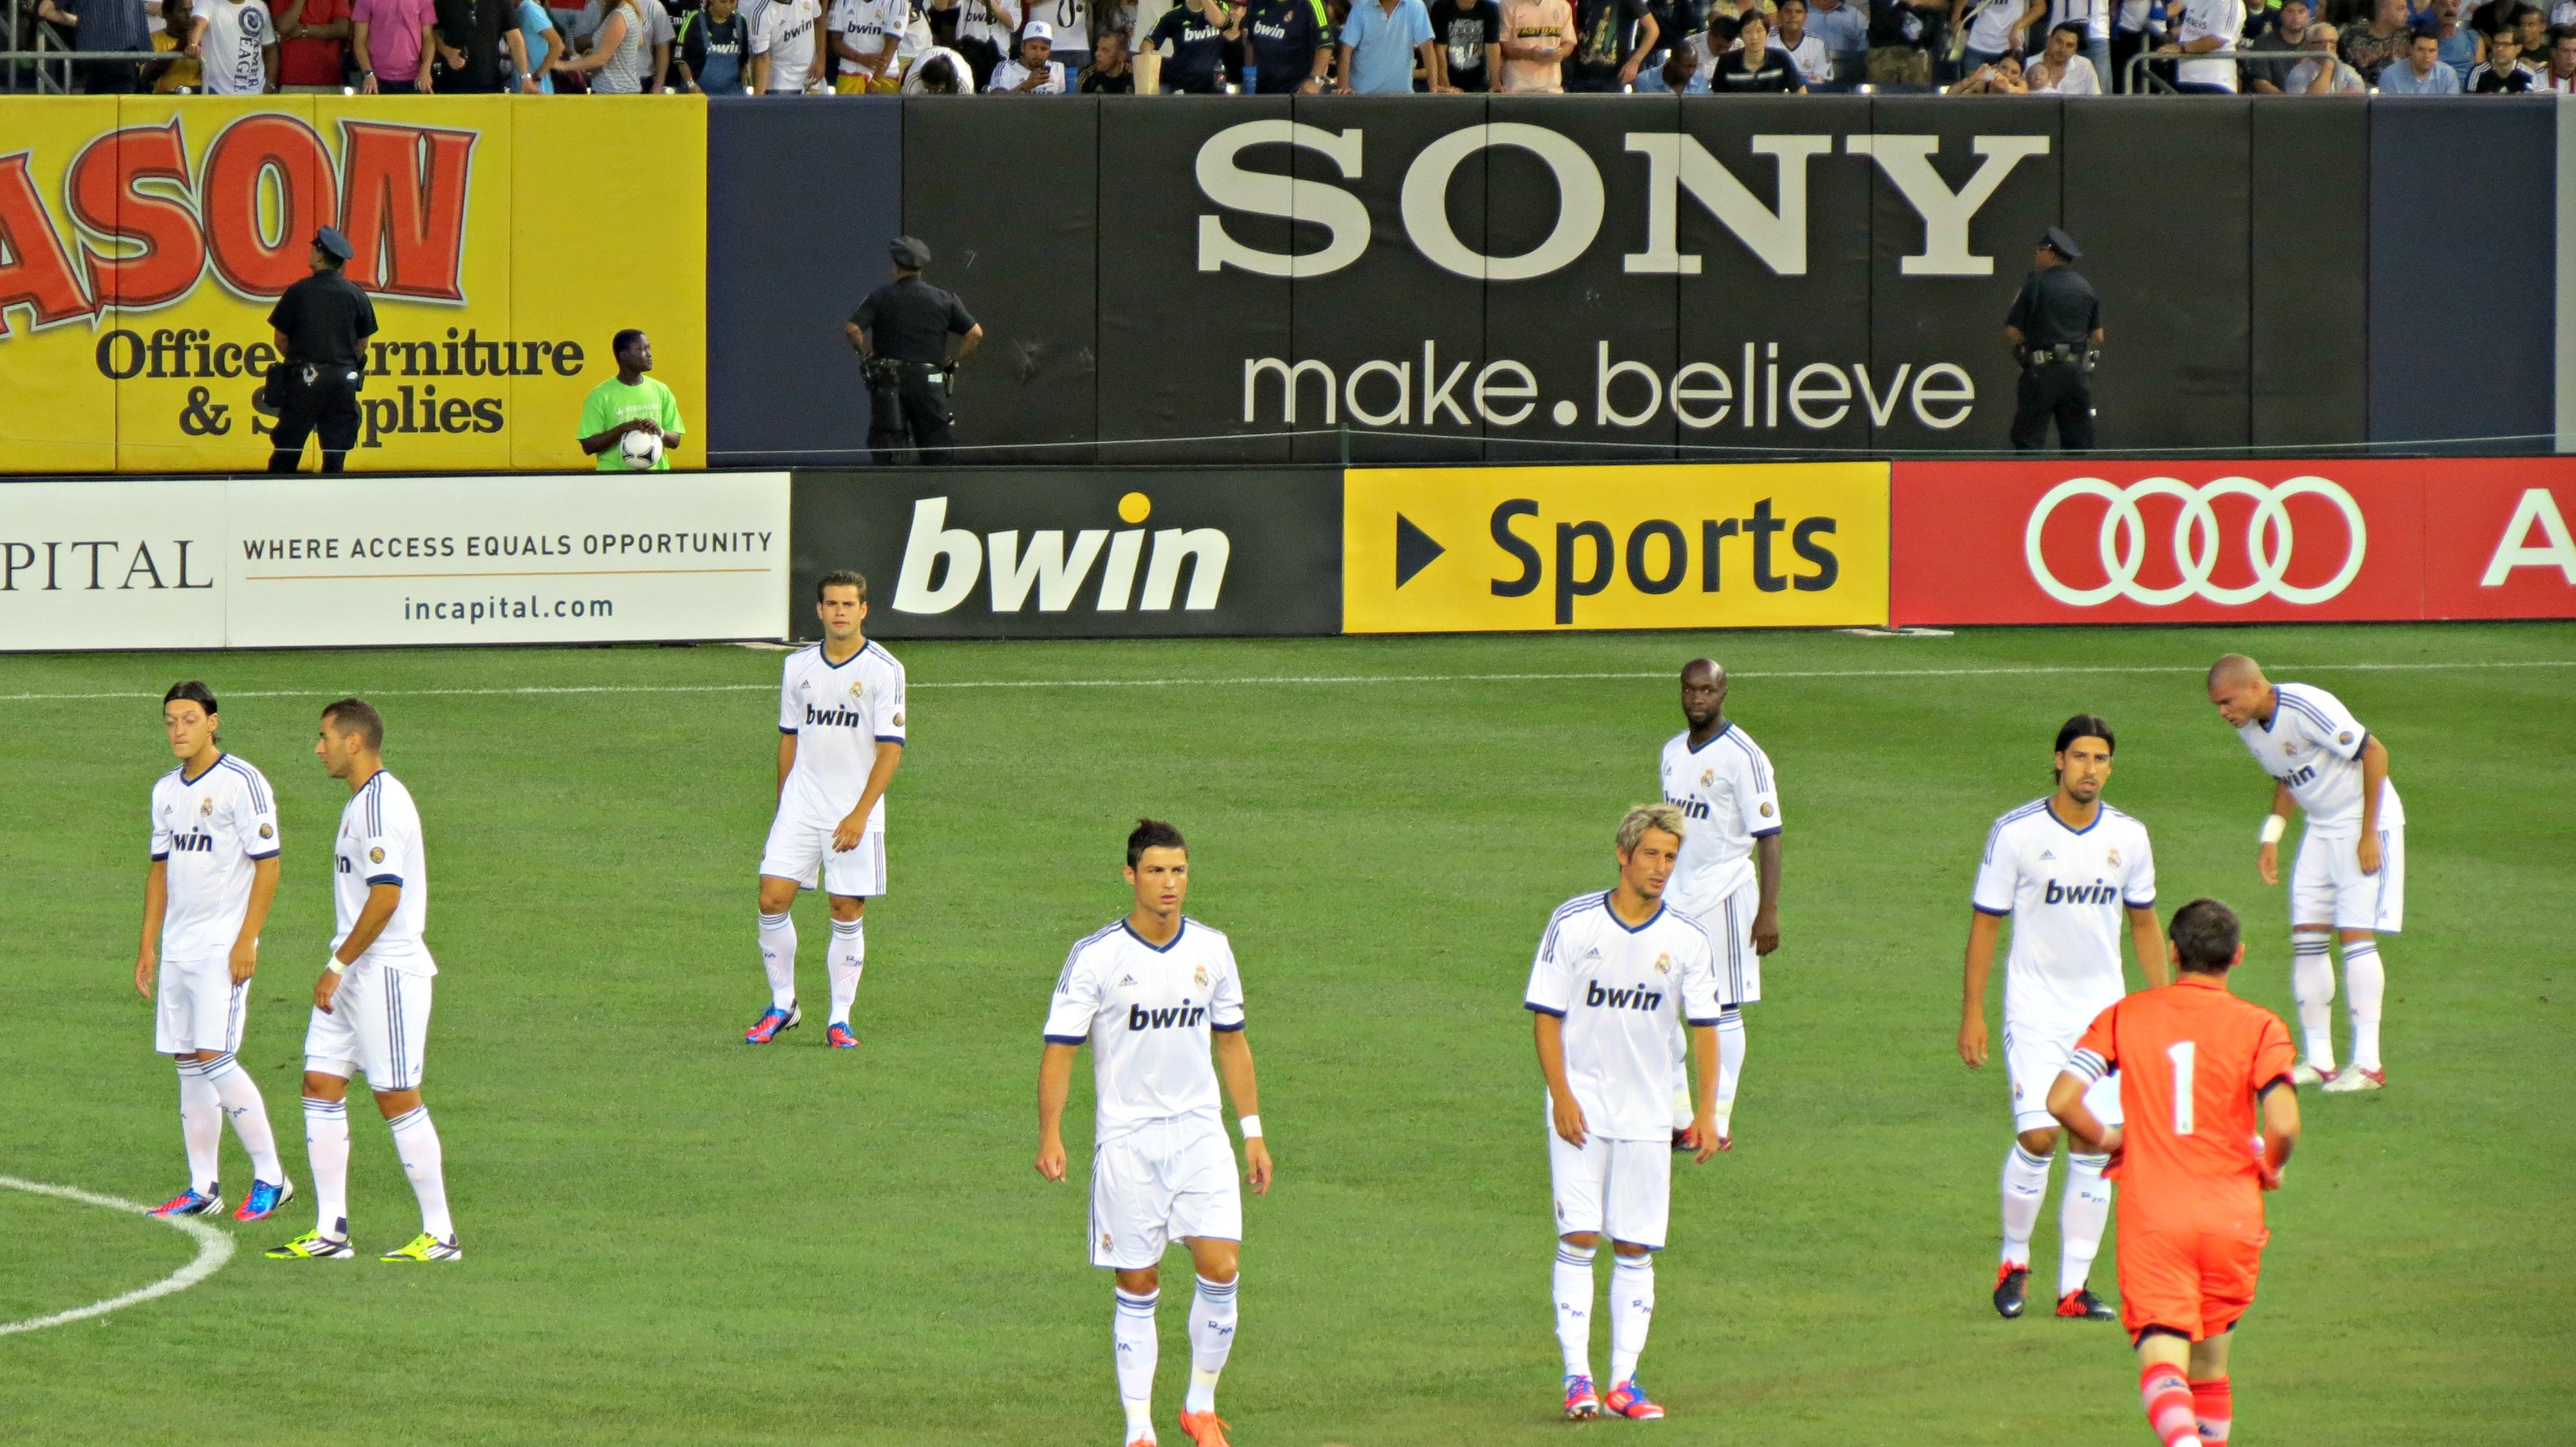 Real Madrid players, Cristiano Ronaldo, Mesut Ozil, Karim Benzema, Sami Khedira, Pepe and Iker Casillas in Yankee Stadium.